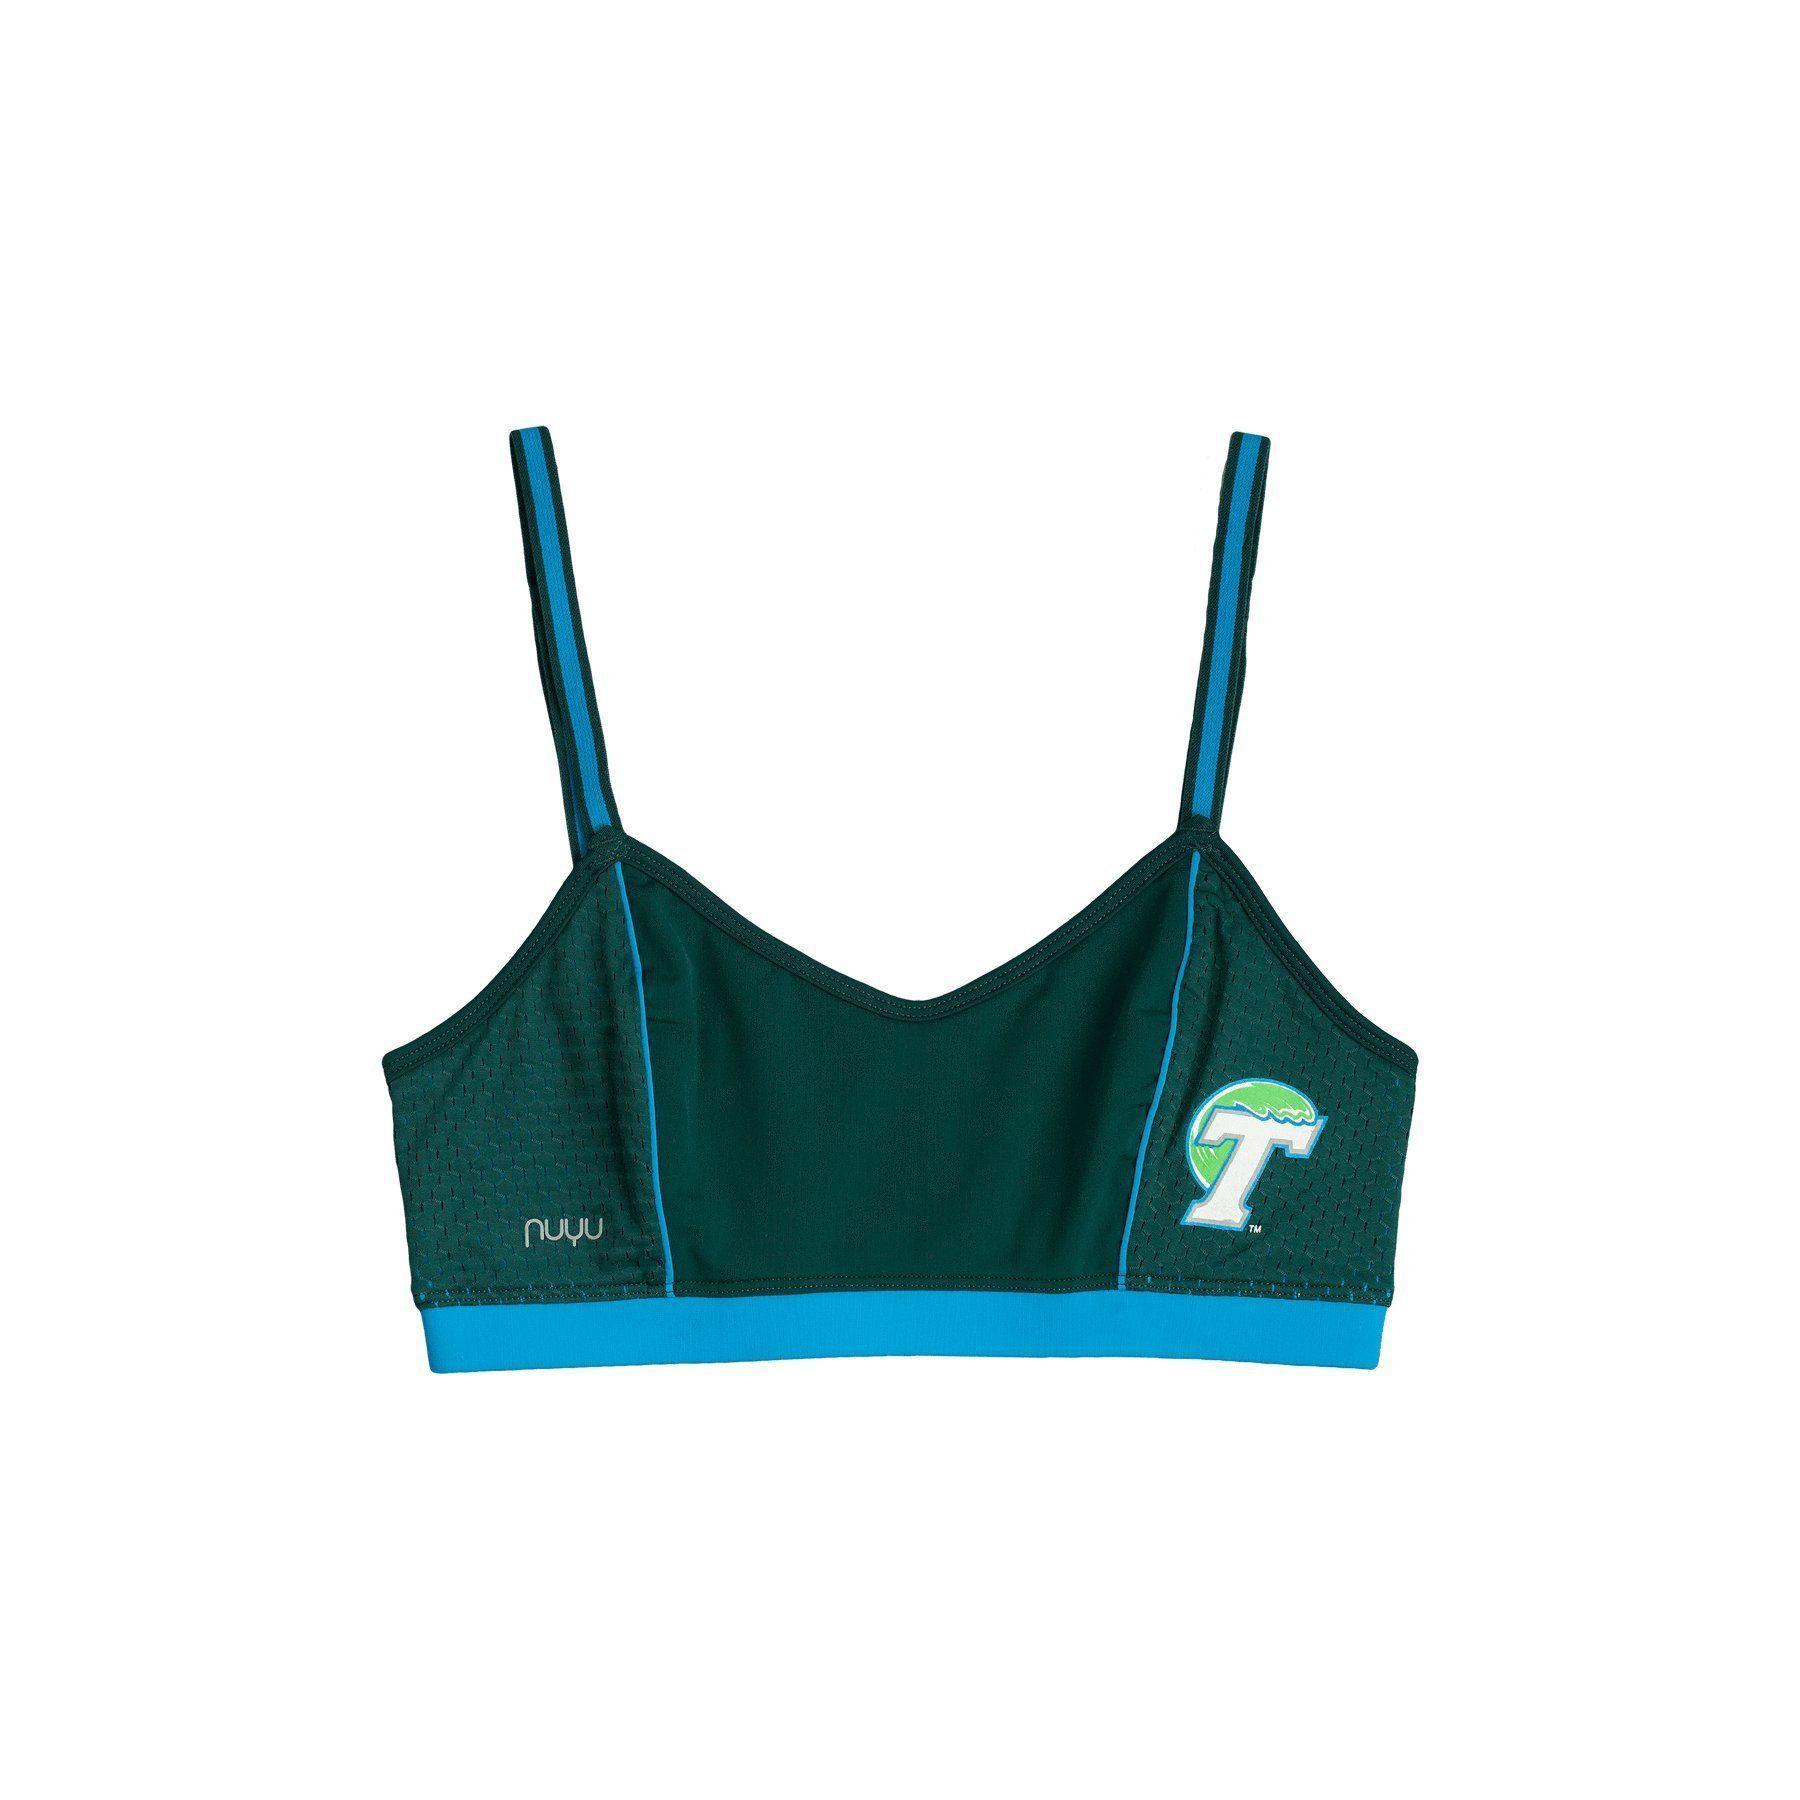 Tulane University Sporty Bralette with Back Straps